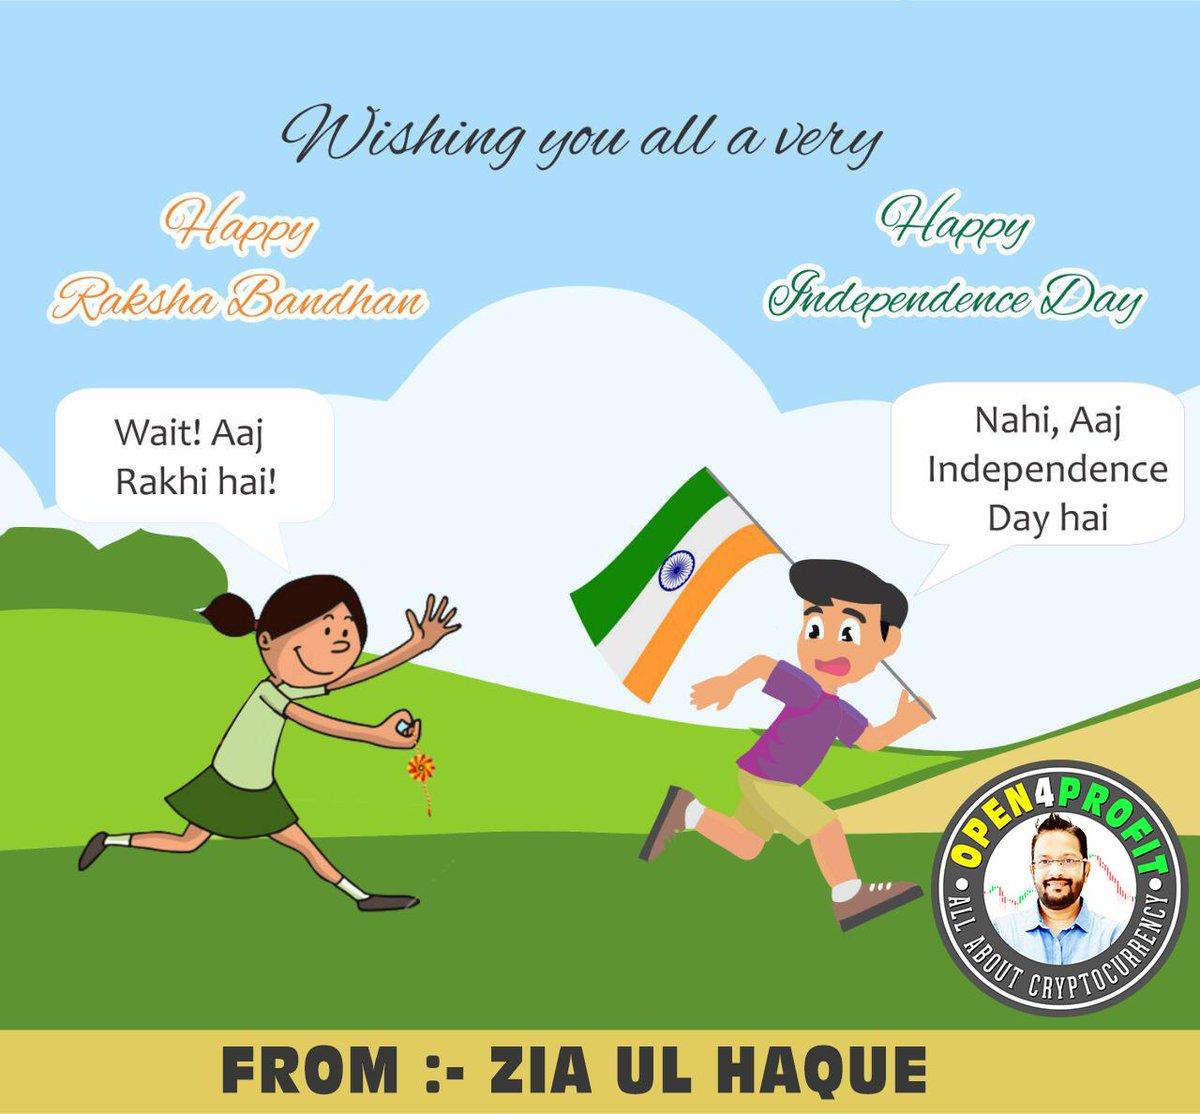 WISHING YOU ALL A VERY #HappyRakshabandhan & #IndependenceDayindia2019 #स्वतंत्रतादिवस #JaiHind #IndependenceDayIndia